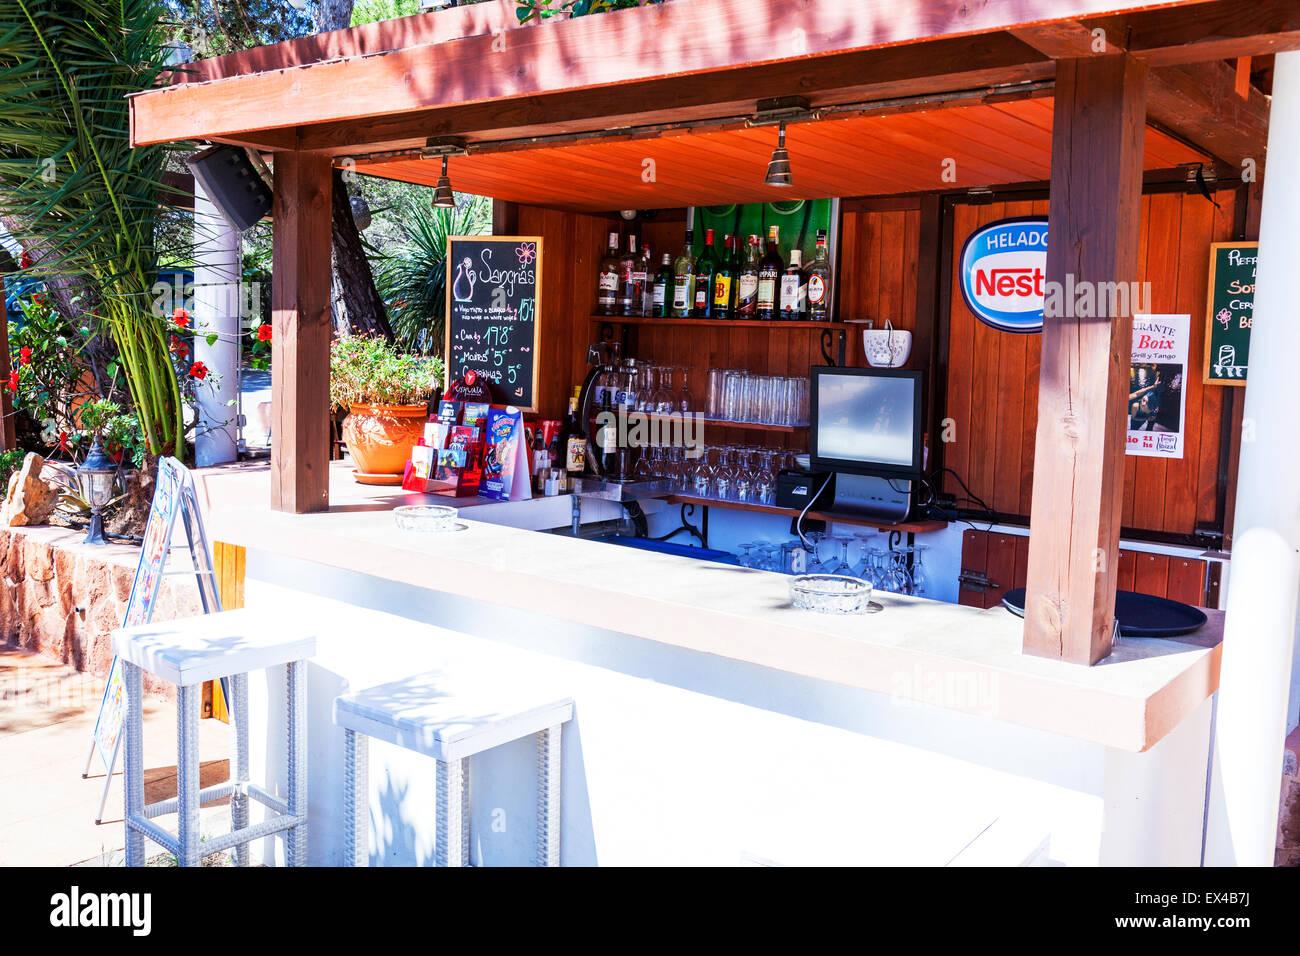 Outside Bar Outside Bar Drinks Pub Barstool Barstools Alcohol Alcoholic Choice